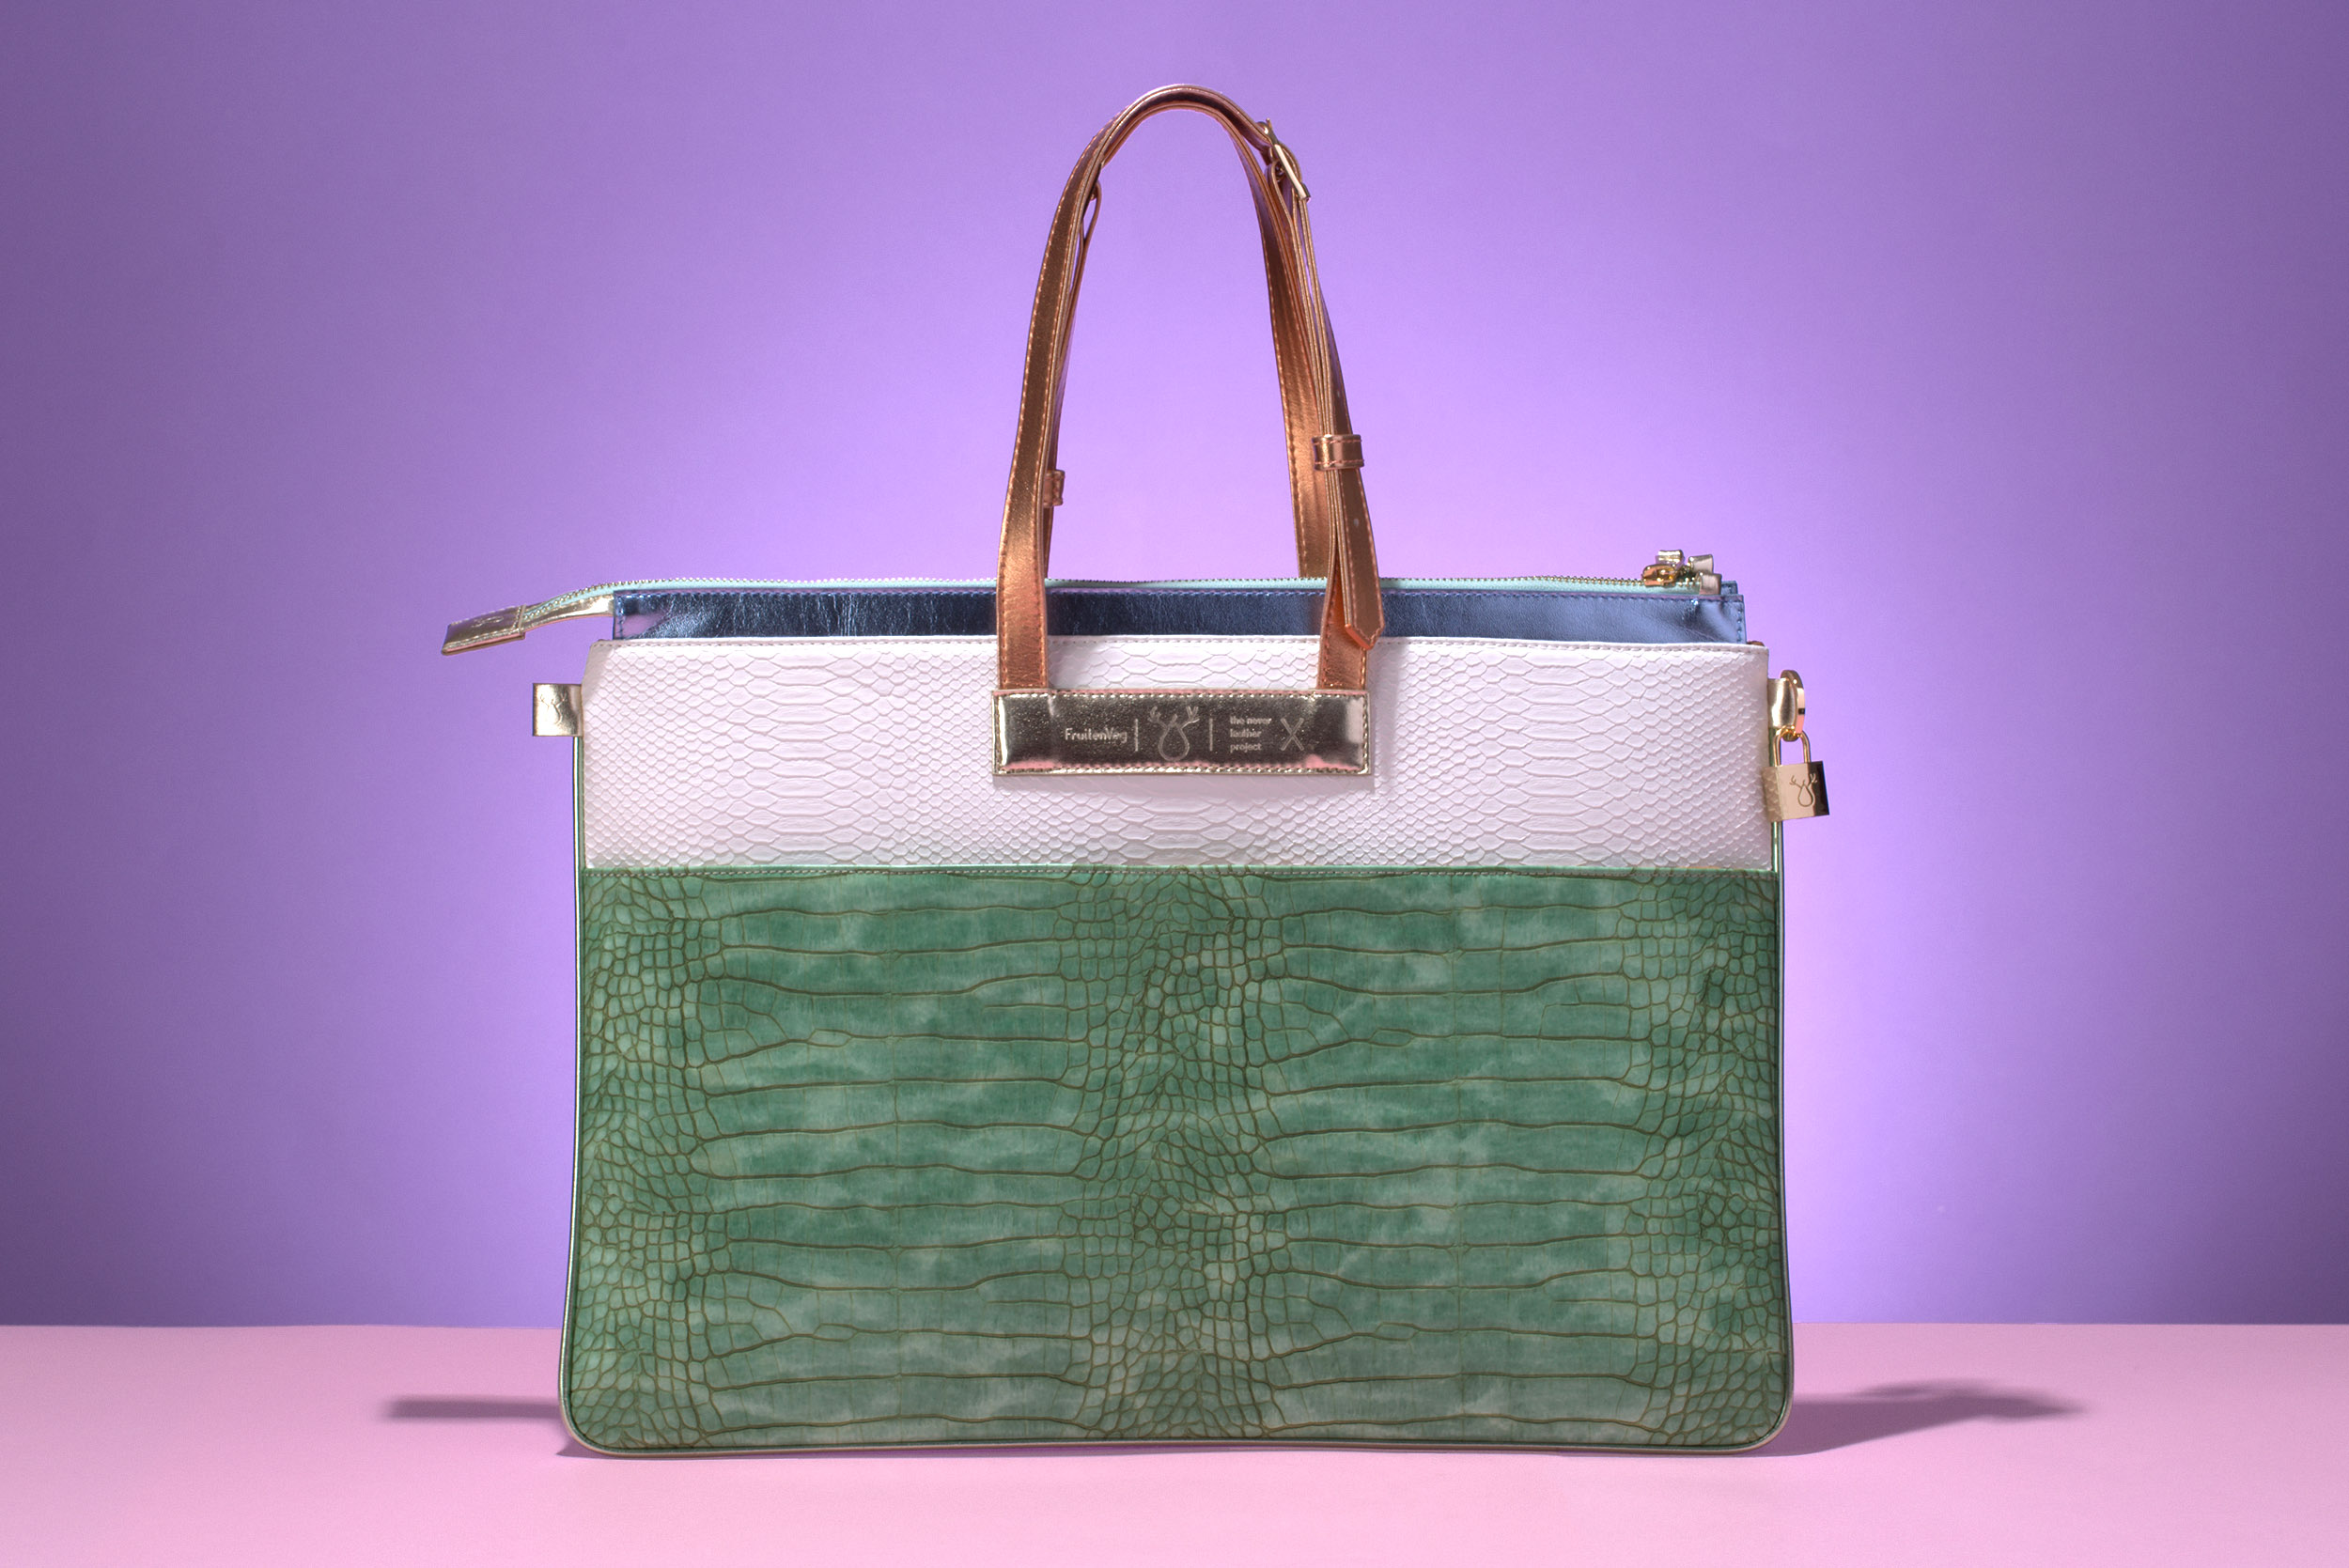 FruitenVeg-MULAYA bag-eco vegan leather-croc-embossed-big-luxury-laptop-handbag-green-white-nude-nyc-handbag-designer